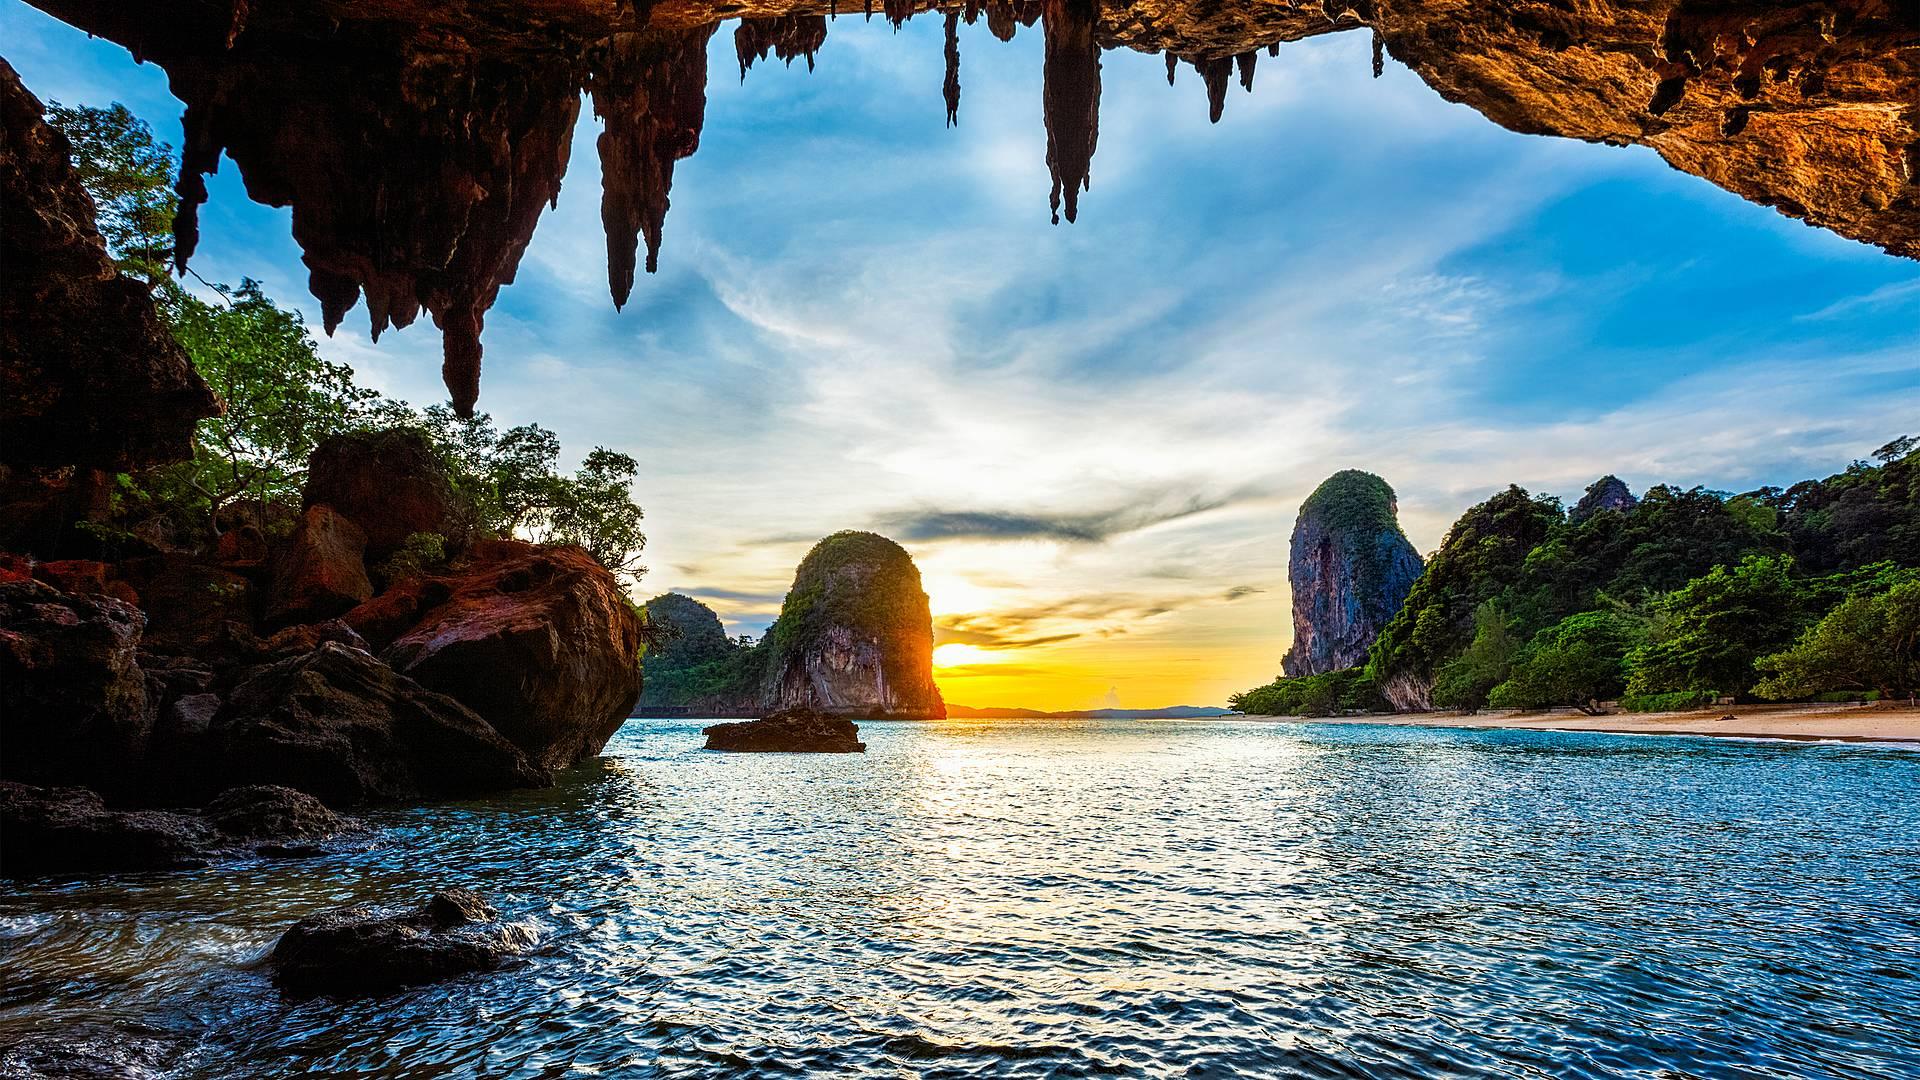 Da Bangkok verso le spiagge di Krabi e Koh Lanta